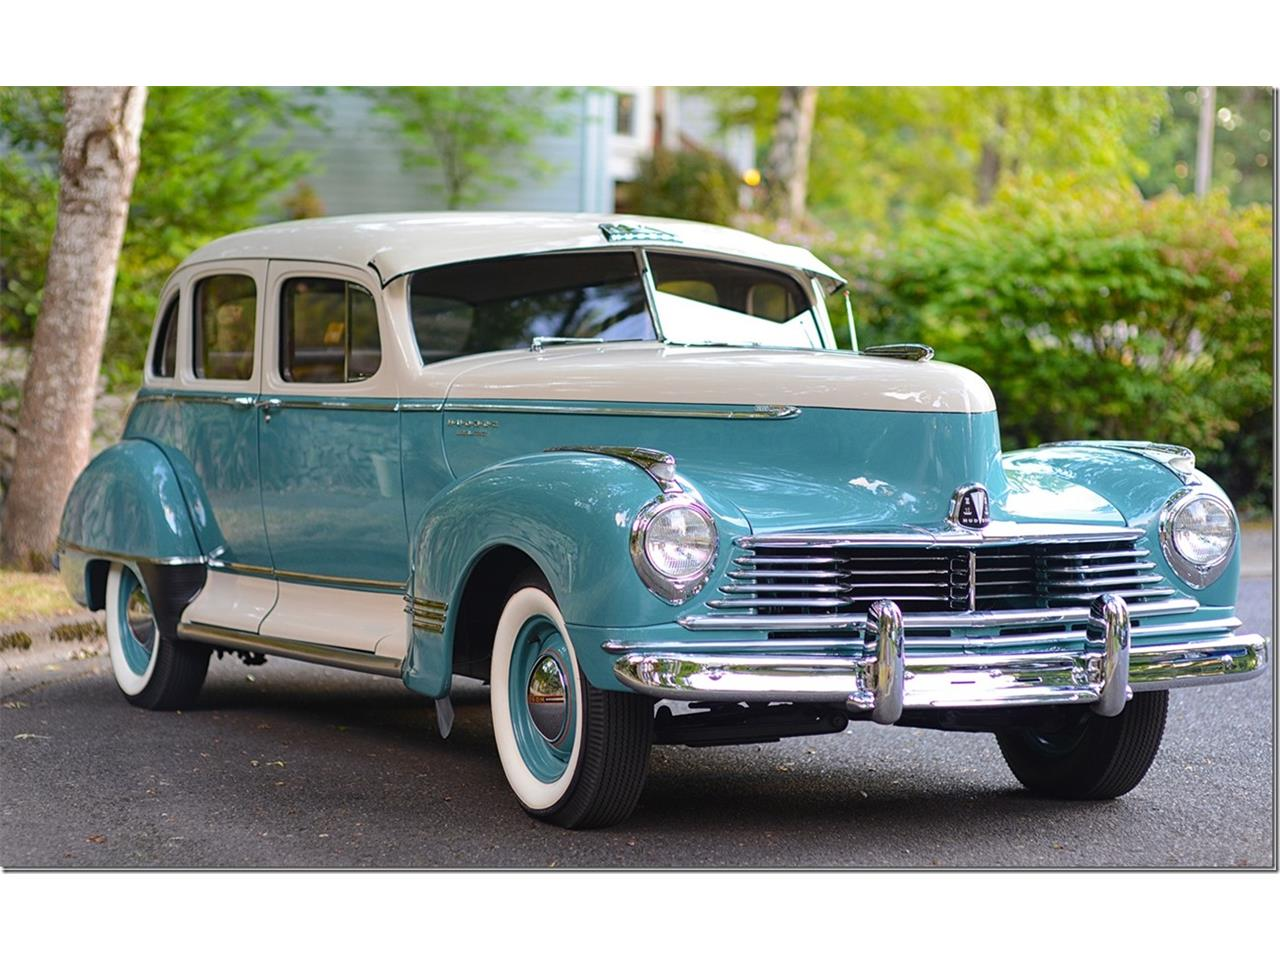 hight resolution of 1947 hudson super 8 for sale classiccars com cc 971913large picture of u002747 super 8